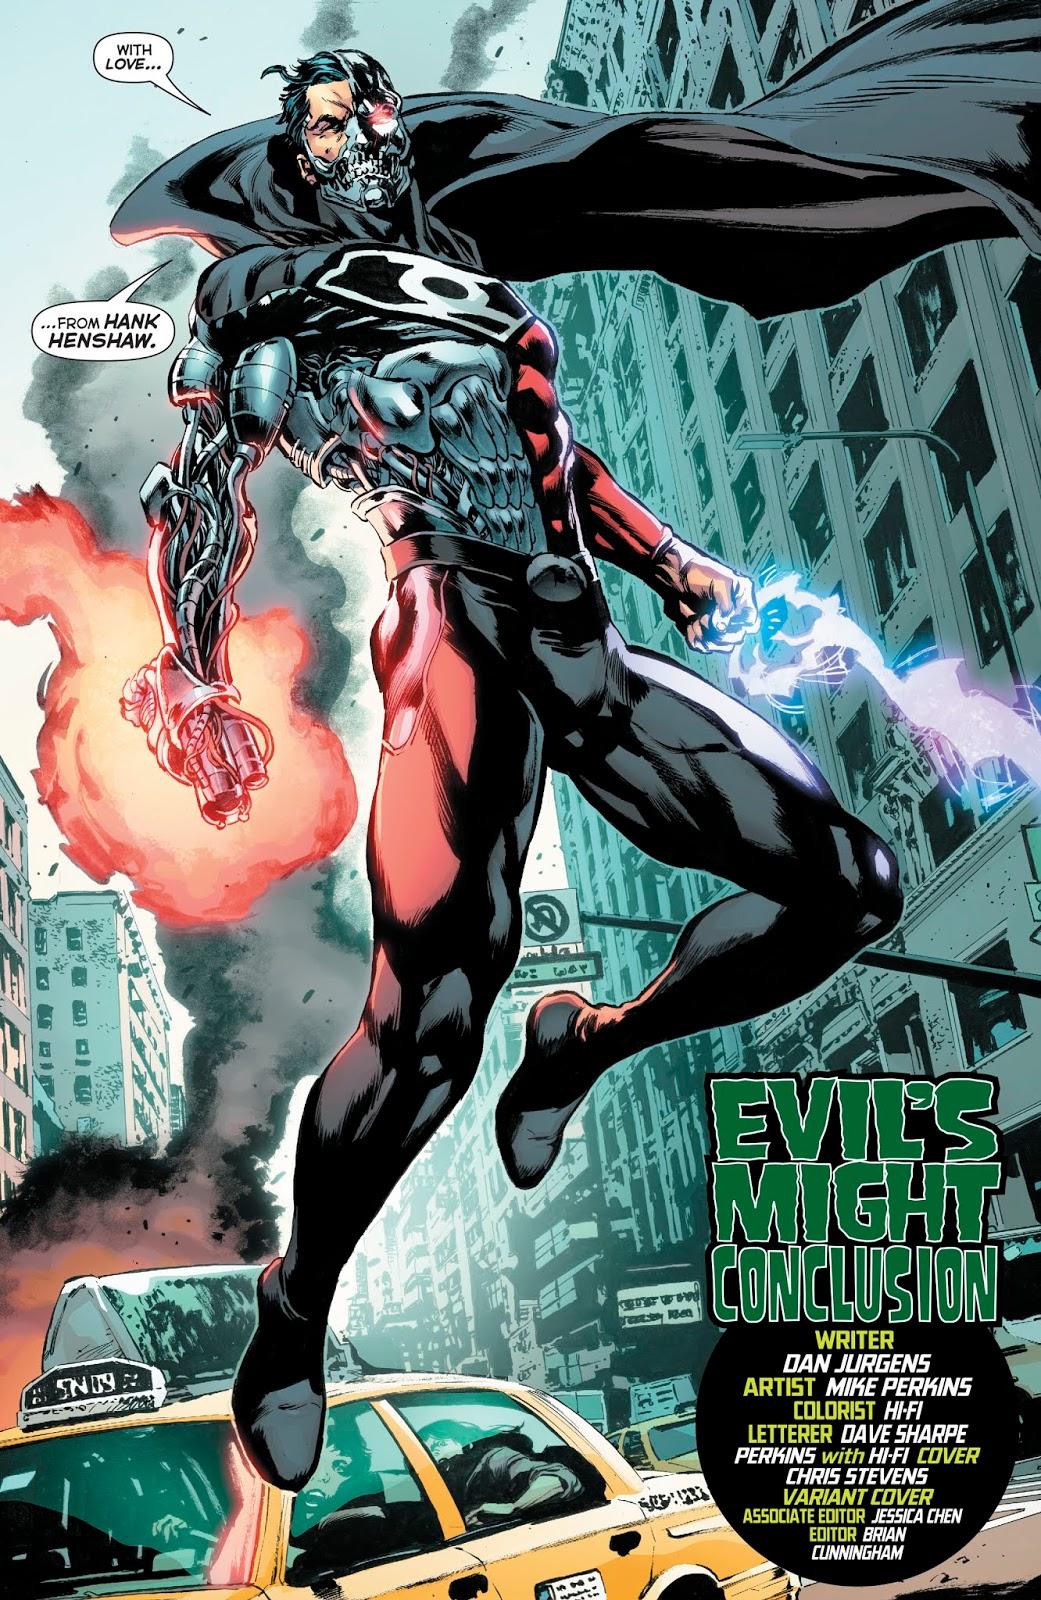 Cyborg-Superman (Green Lanterns Vol. 1 #57)